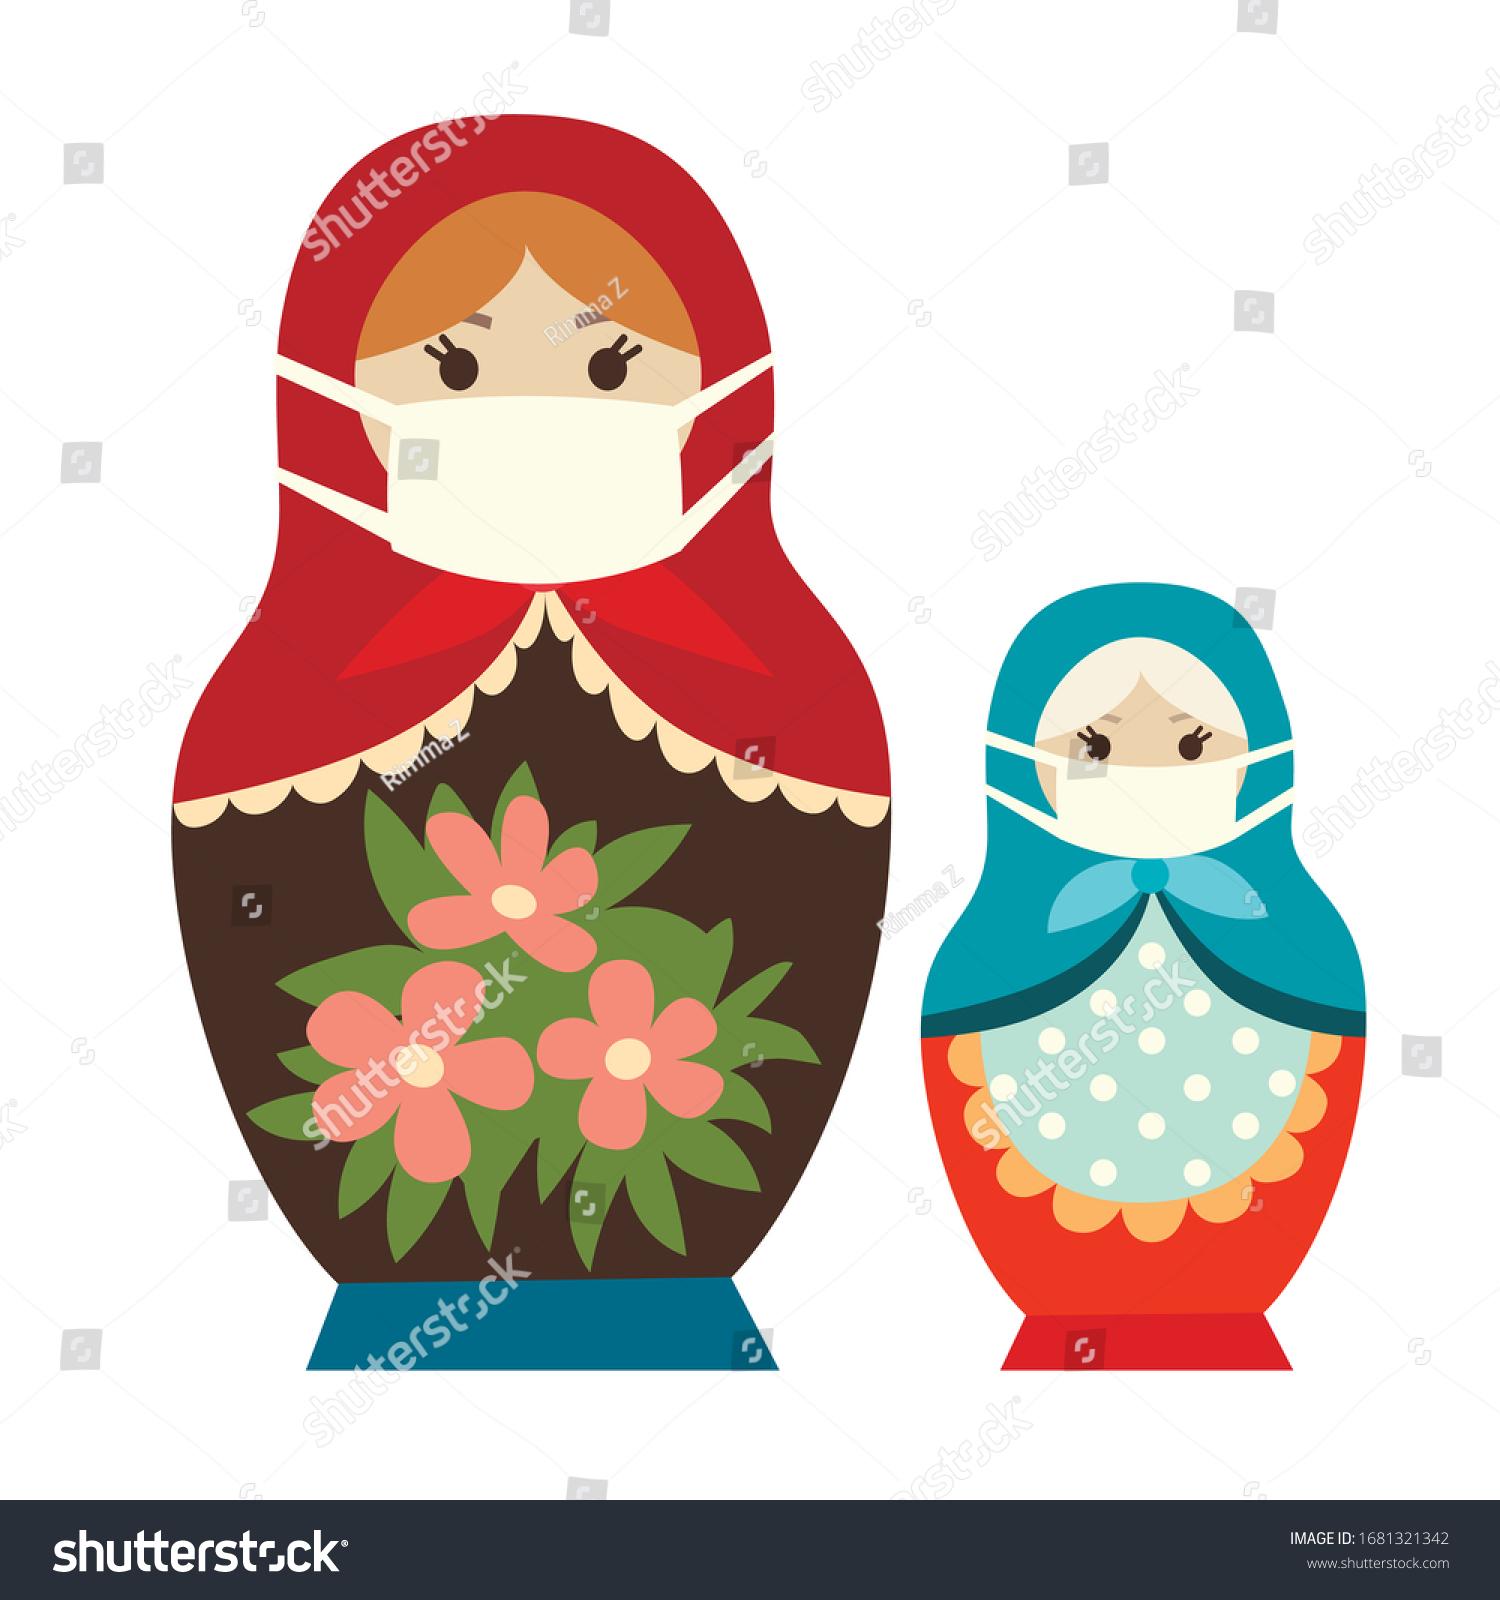 Babushka (matryoshka), Traditional Russian Wooden Nesting Doll.. Royalty  Free Cliparts, Vectors, And Stock Illustration. Image 87434654.